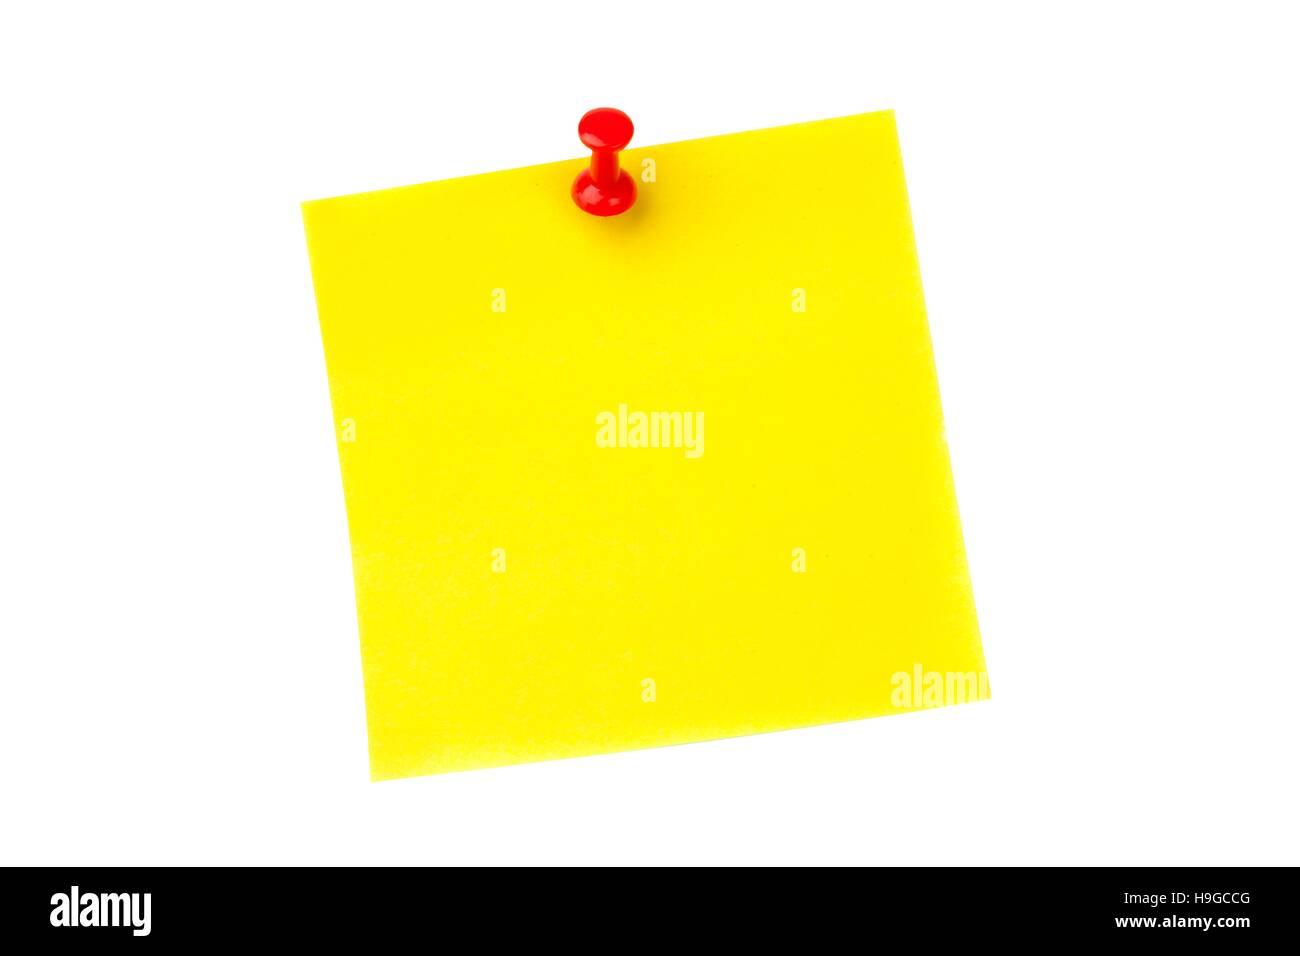 Illustrative image of pushpin on yellow paper - Stock Image